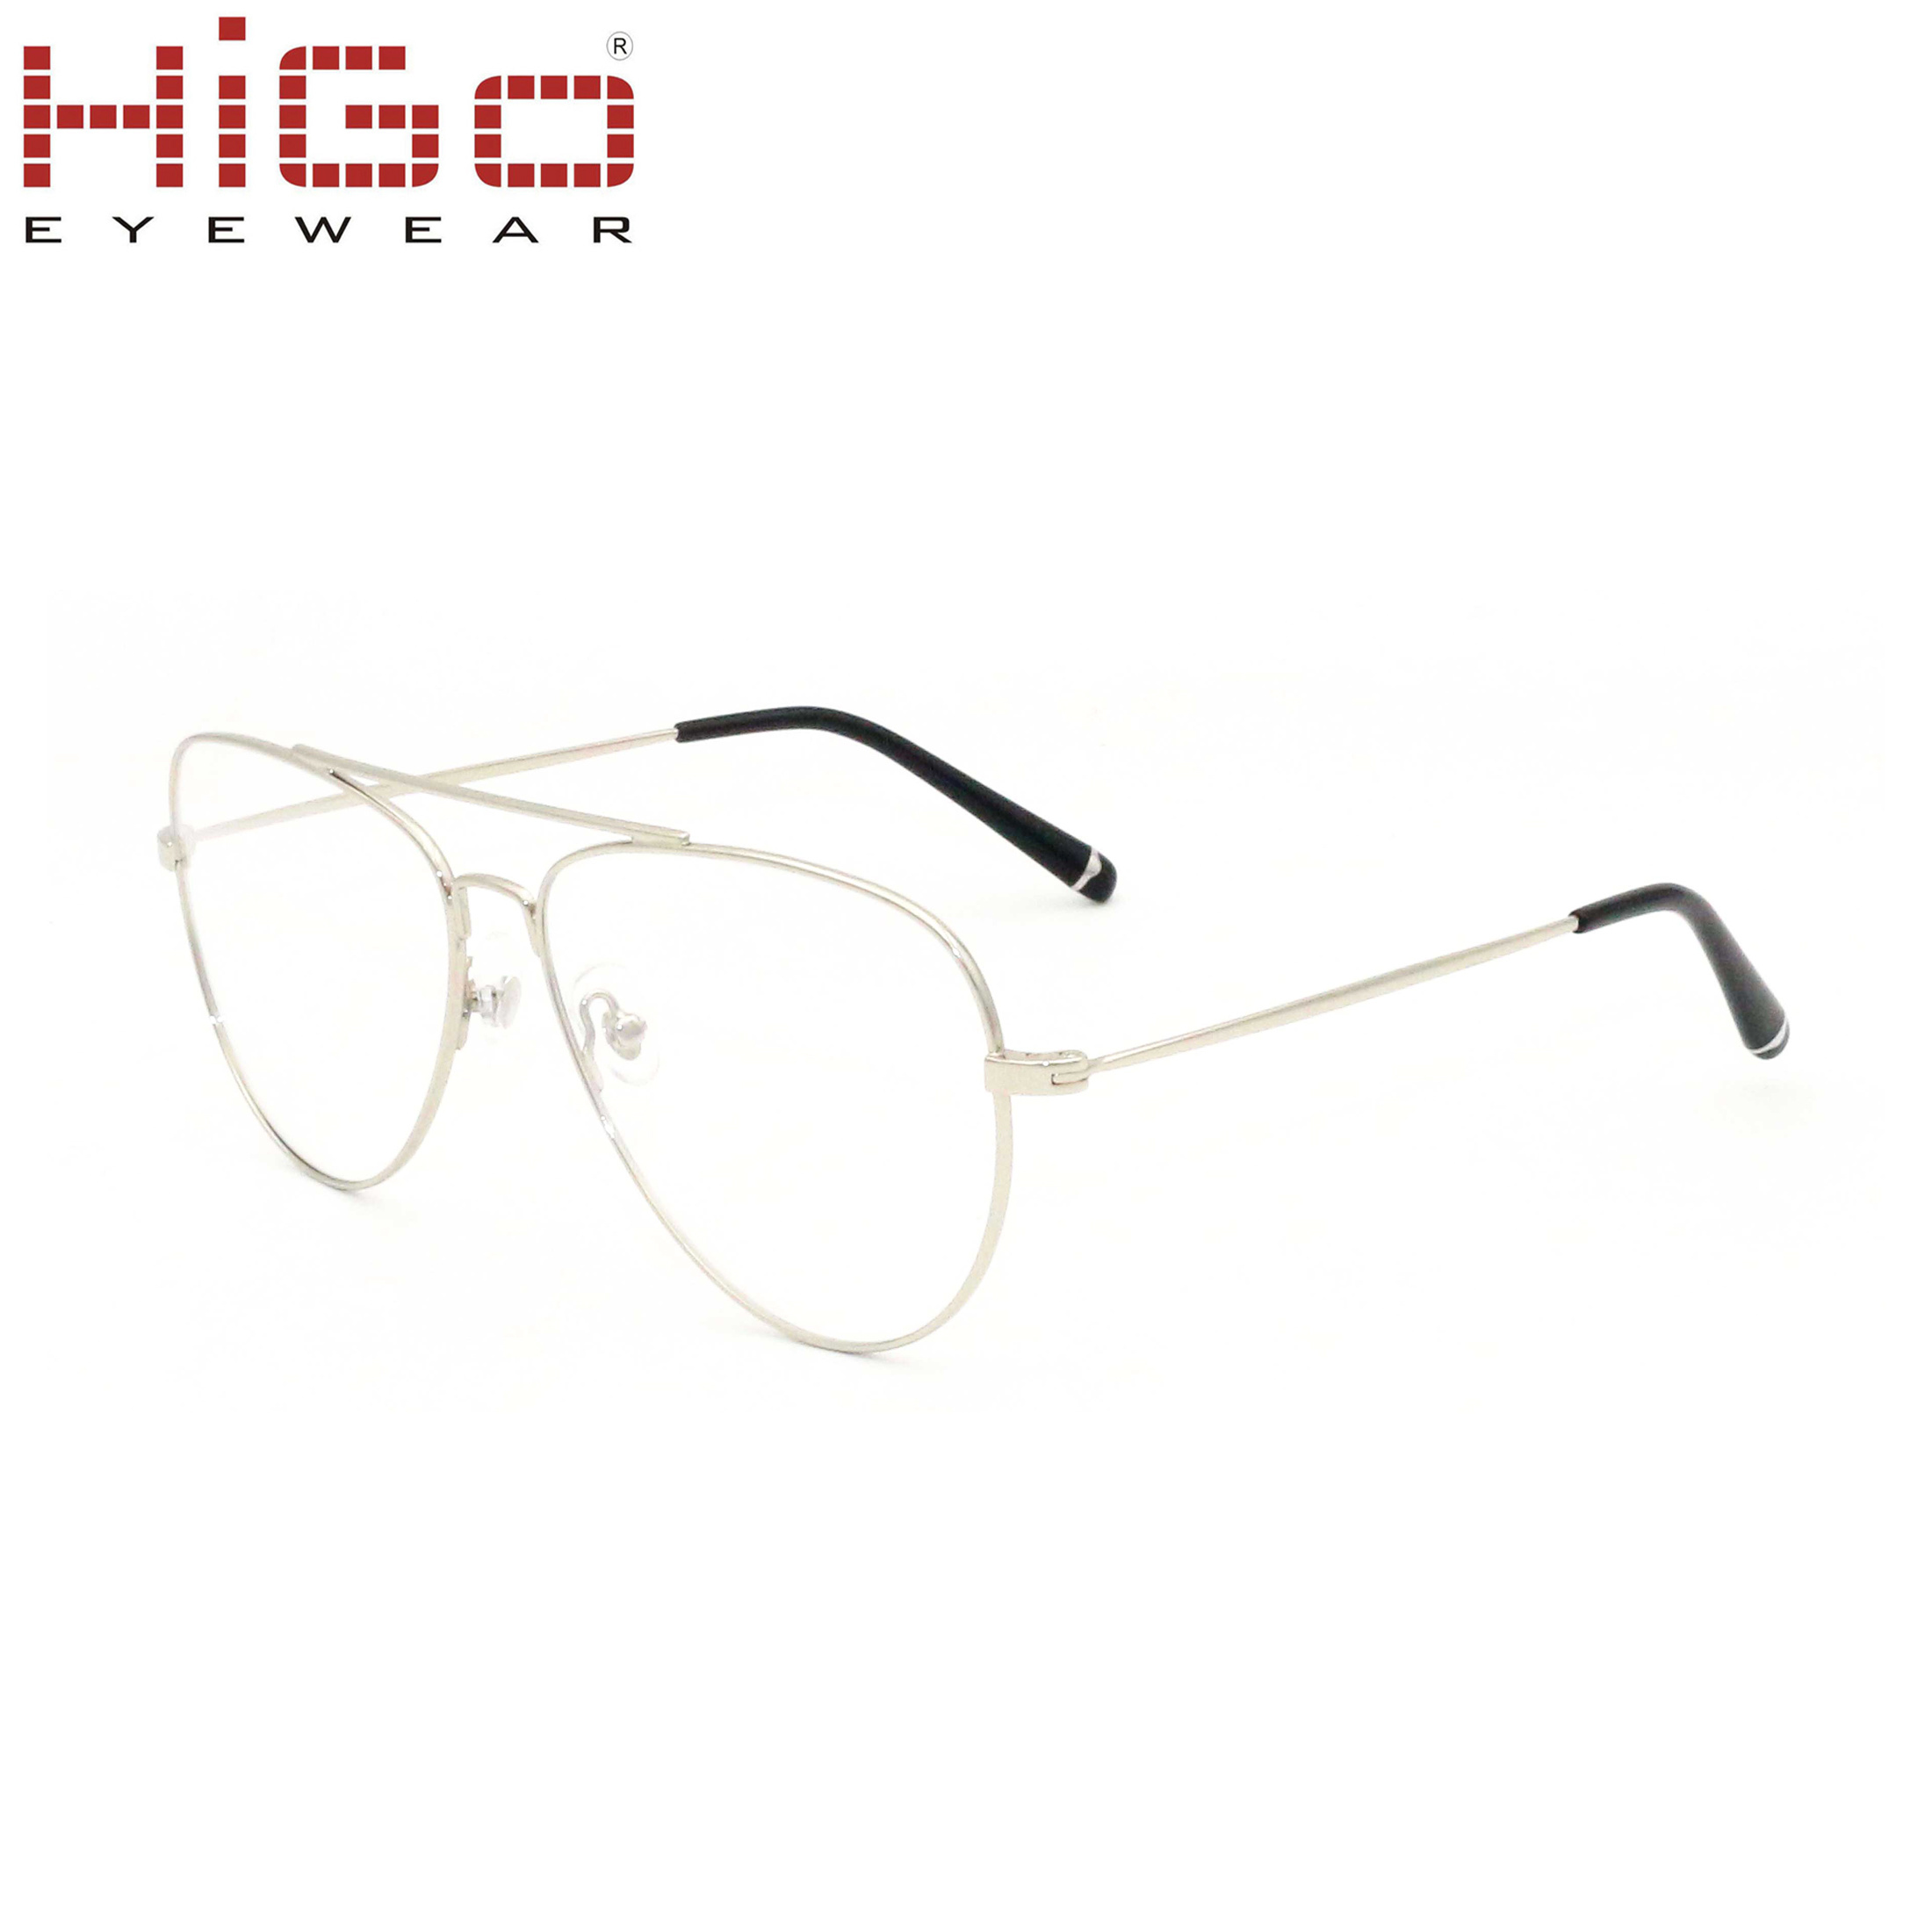 627baaaf5001 China Manufacturers in China Metal Optical Glasses Eyewear Frames ...